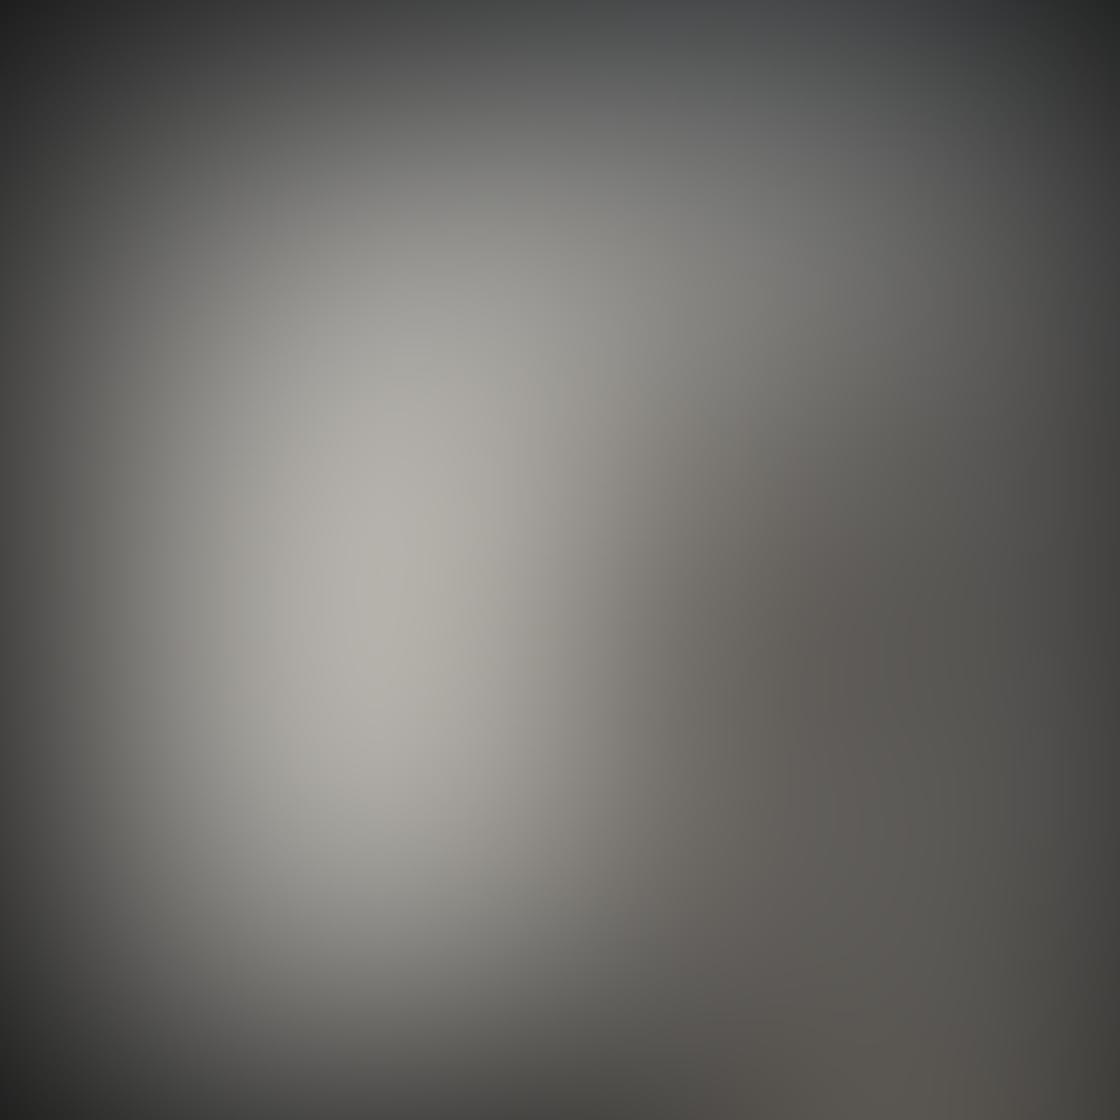 iPhone Photo Shadows 2